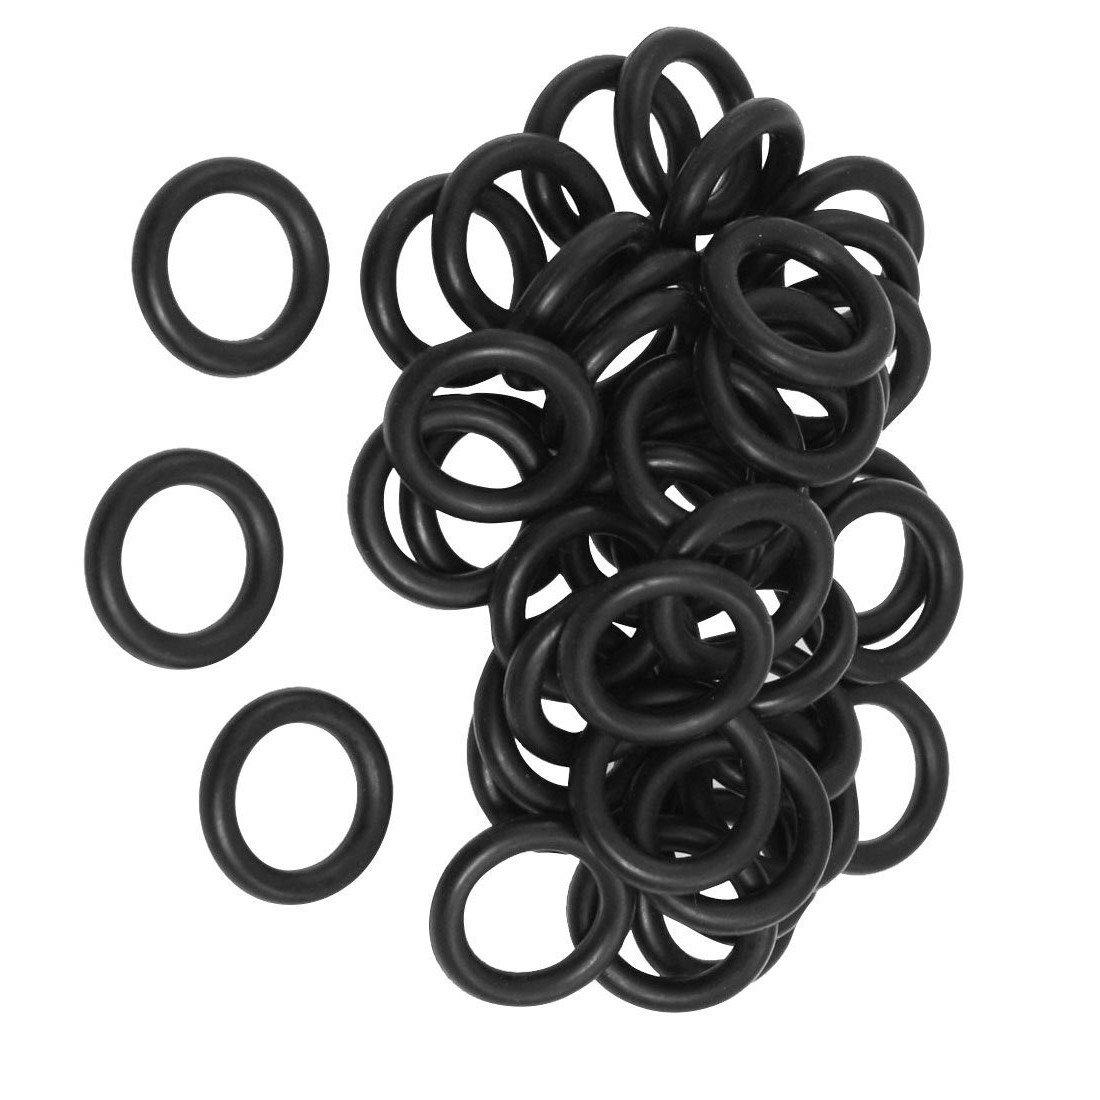 R SODIAL 16 mm x 3 mm Schwarz Nitrilkautschuk O Ring NBR Dichtungen Dichtungen 50 Stueck O-Ringe